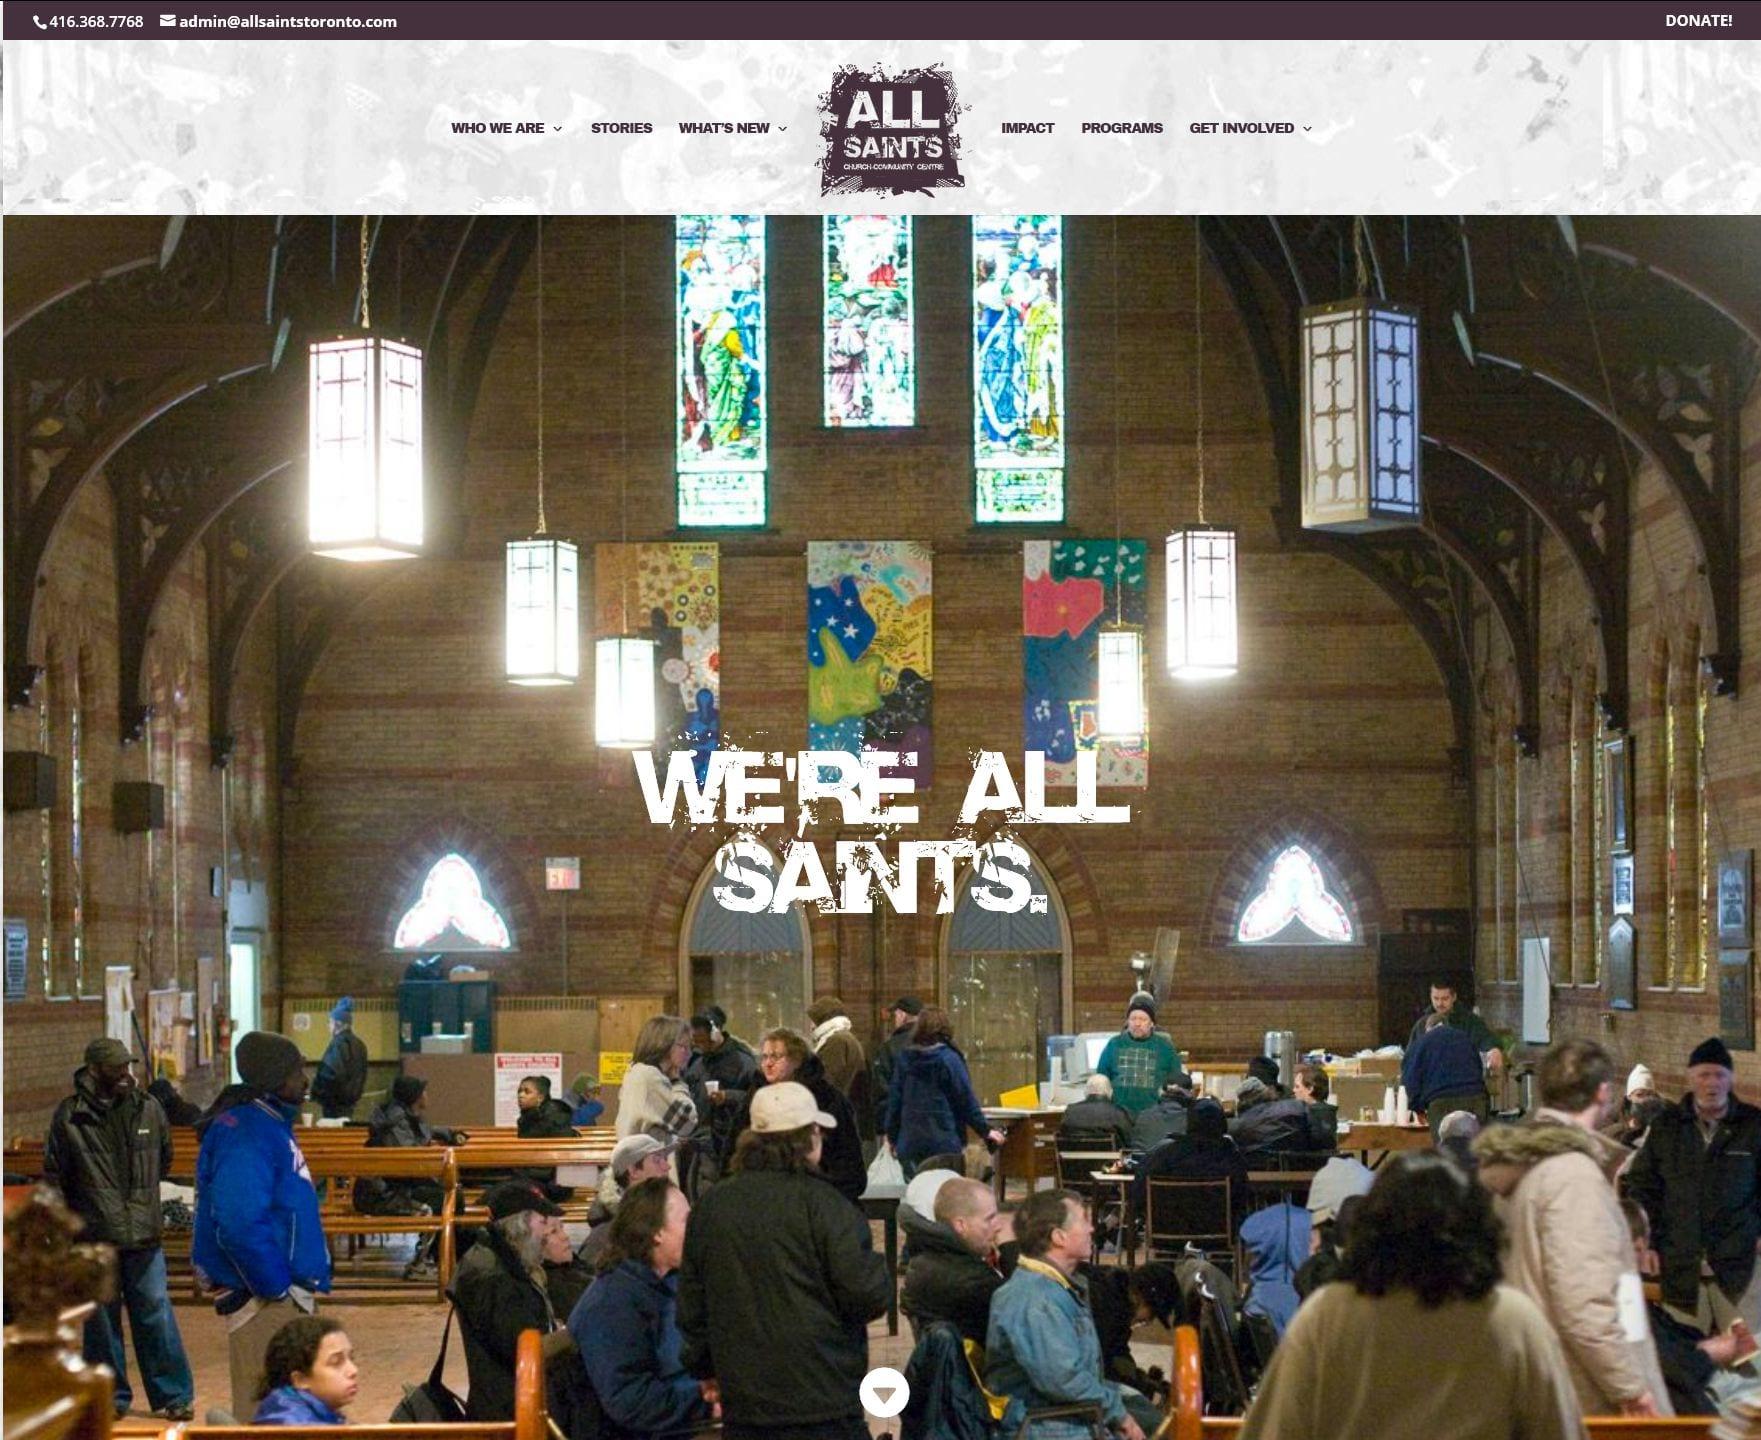 all_saints_website